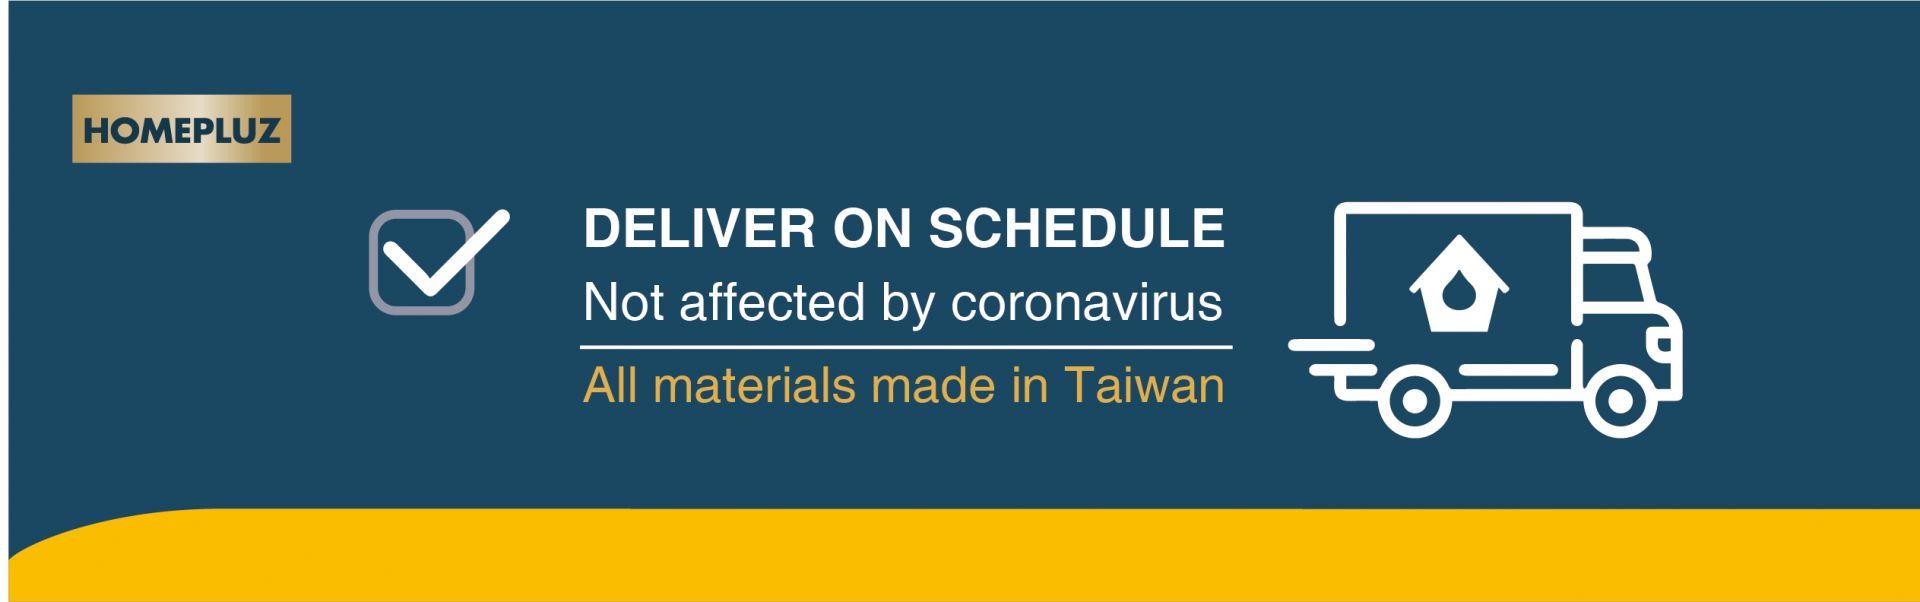 Homepluz Operation Not Affected by Coronavirus